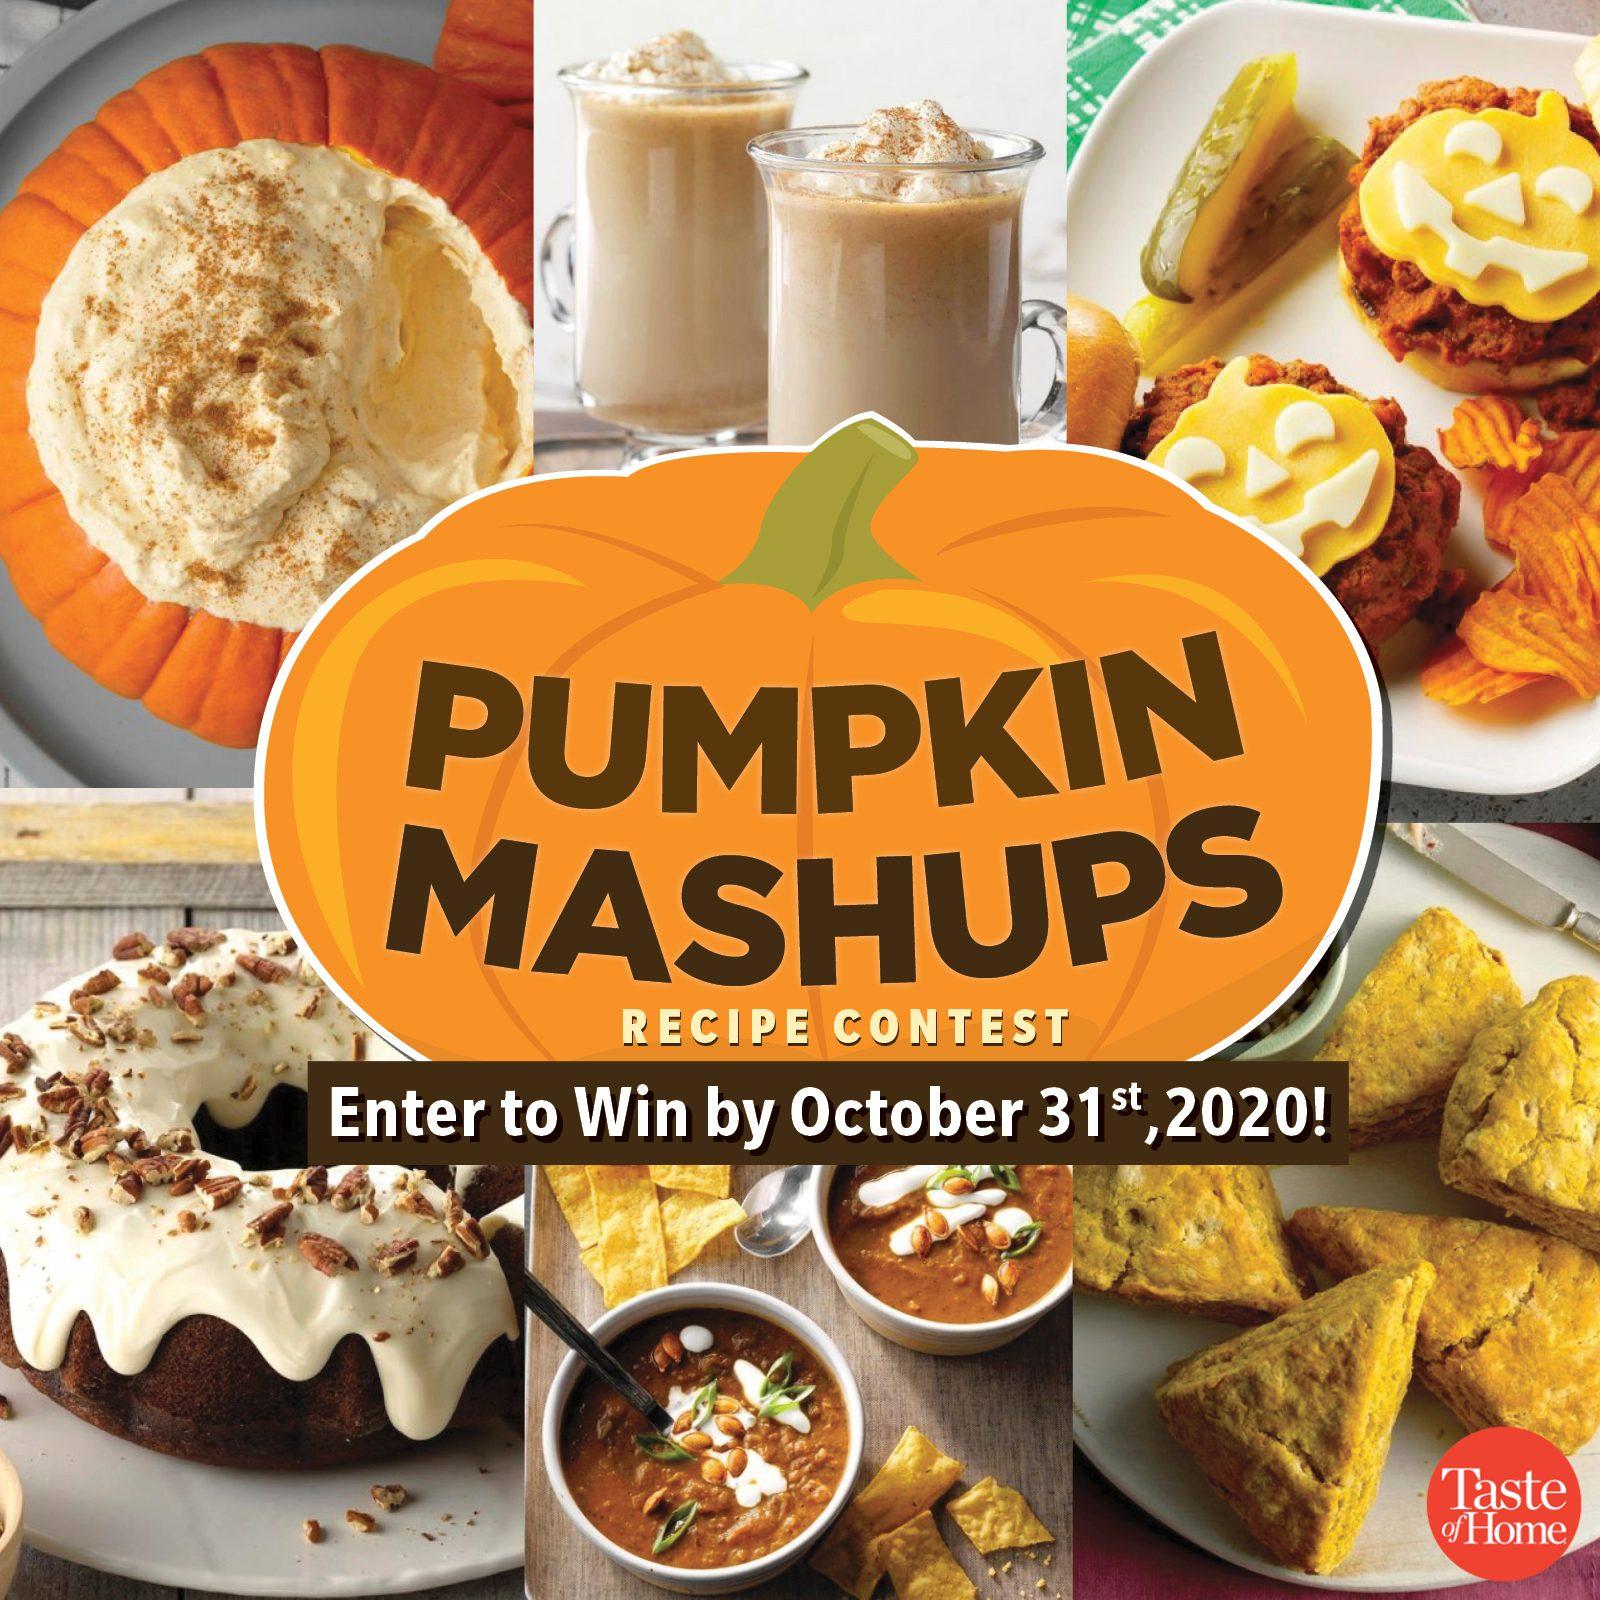 taste of home recipe contest Pumpkin Mashups